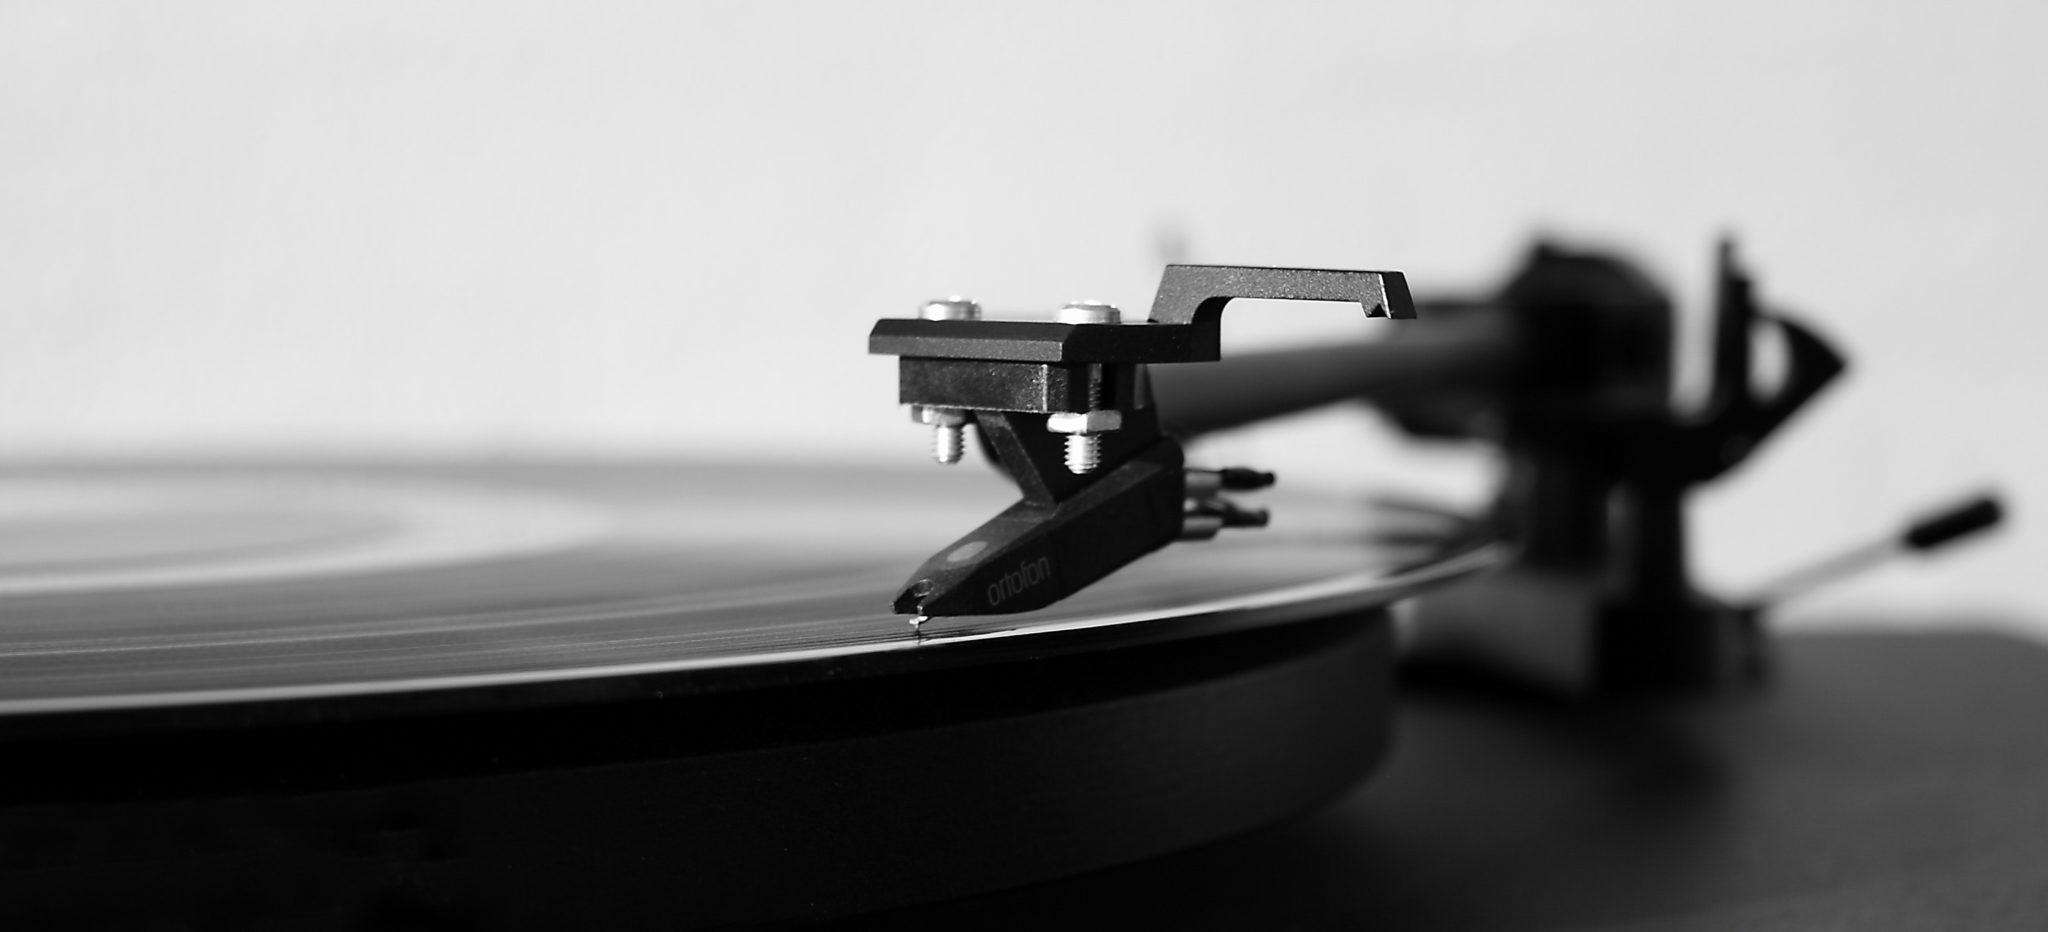 La música: otra forma de aproximarse a la historia